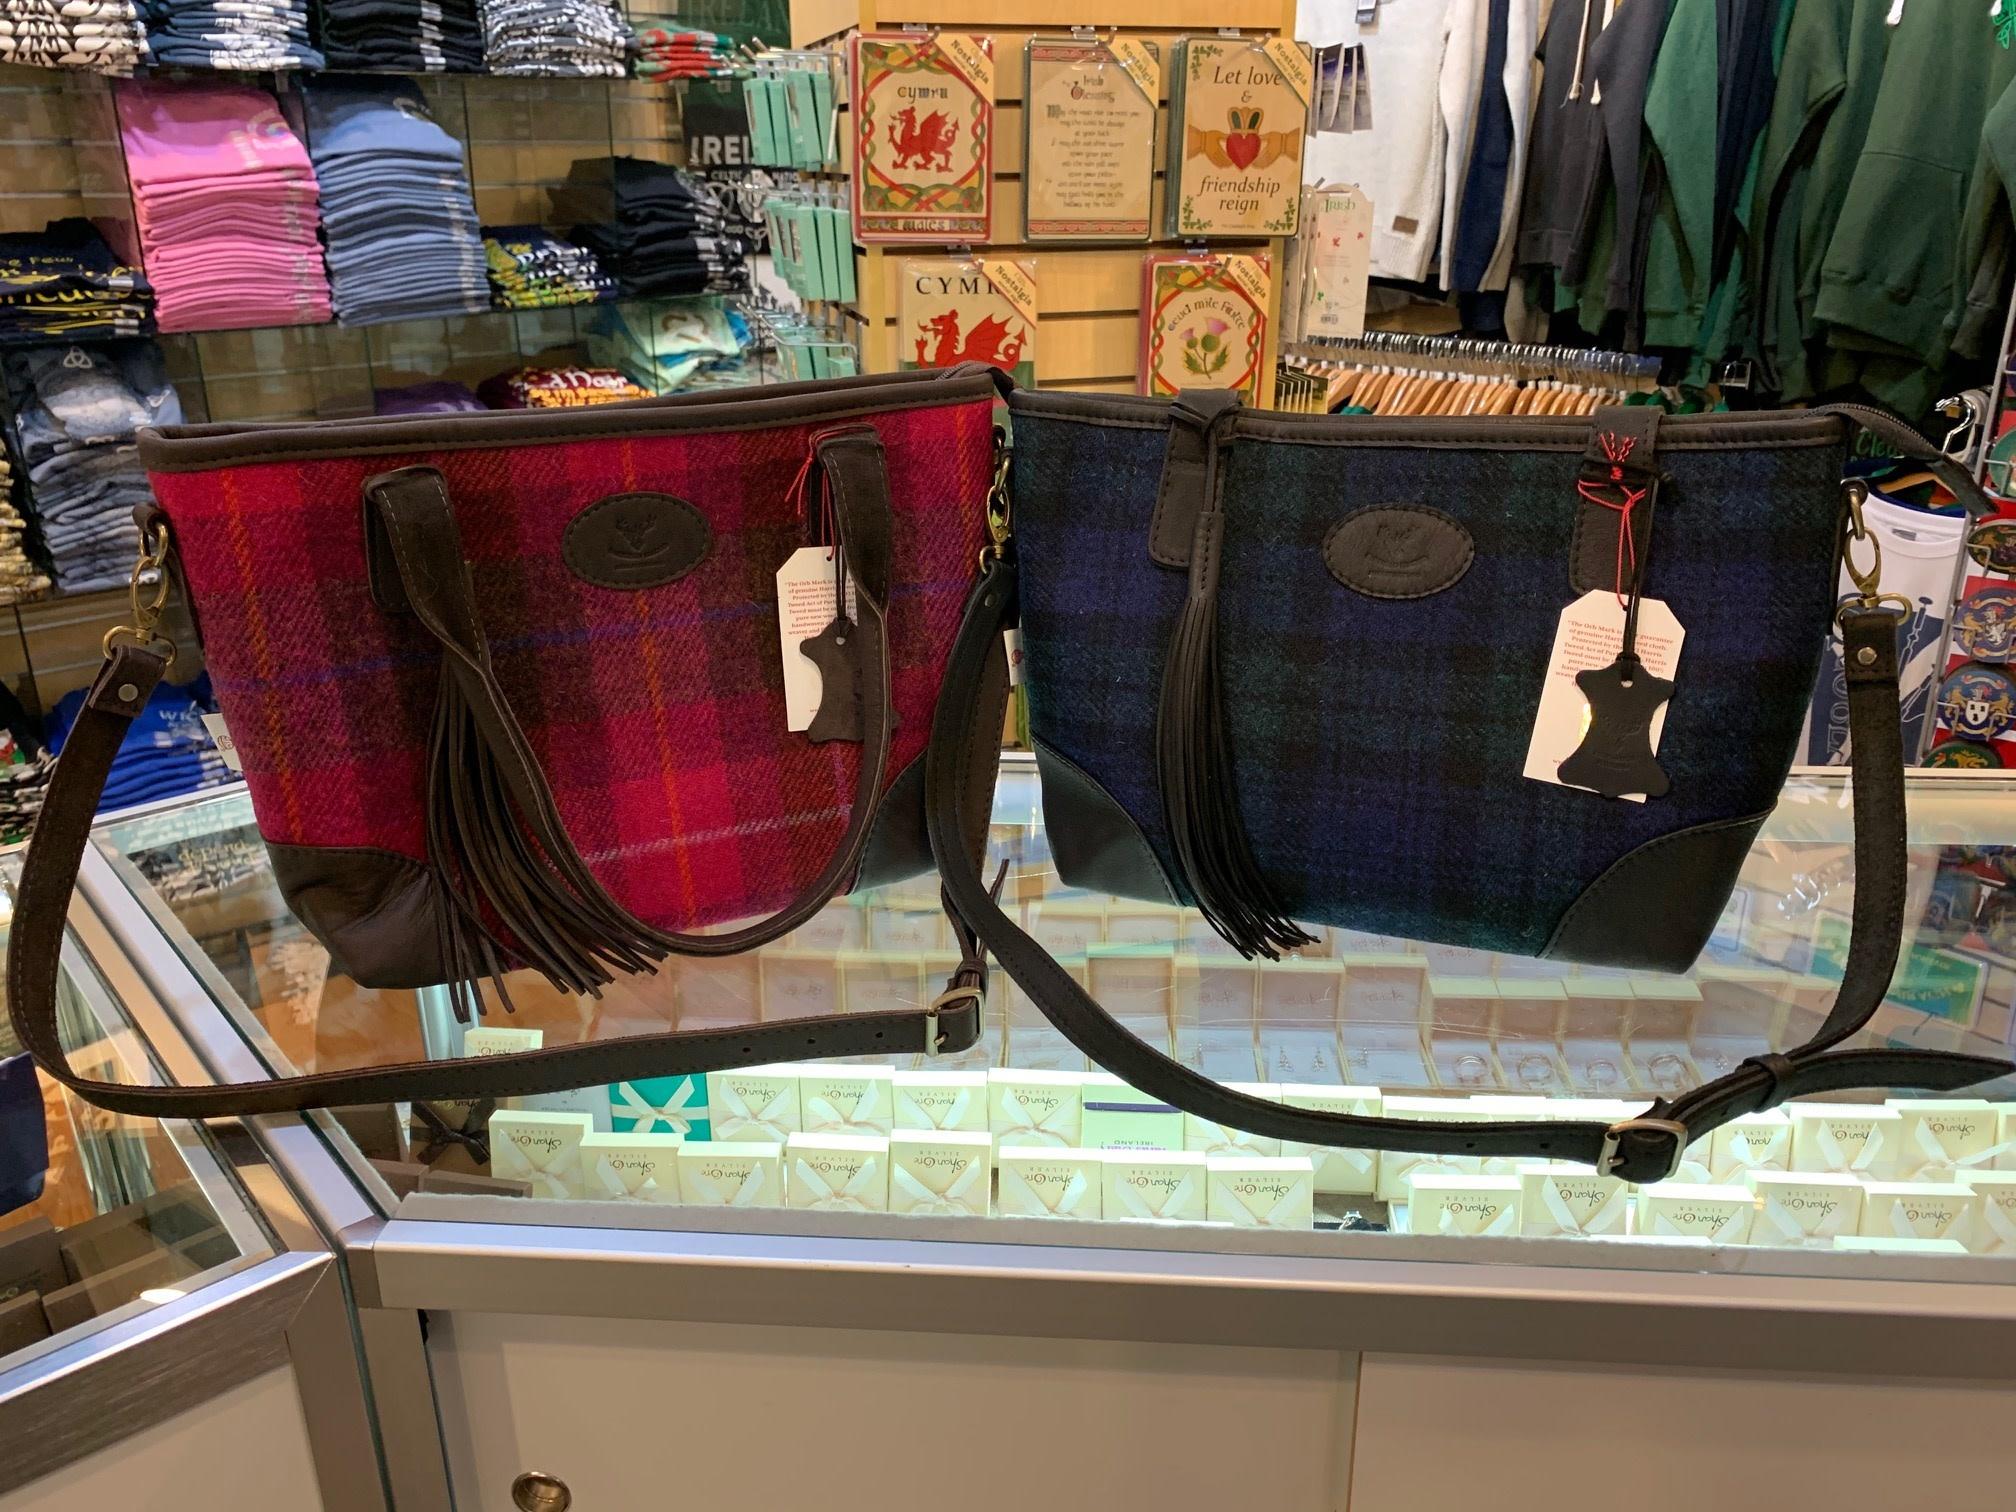 Bag: Gretel Leather